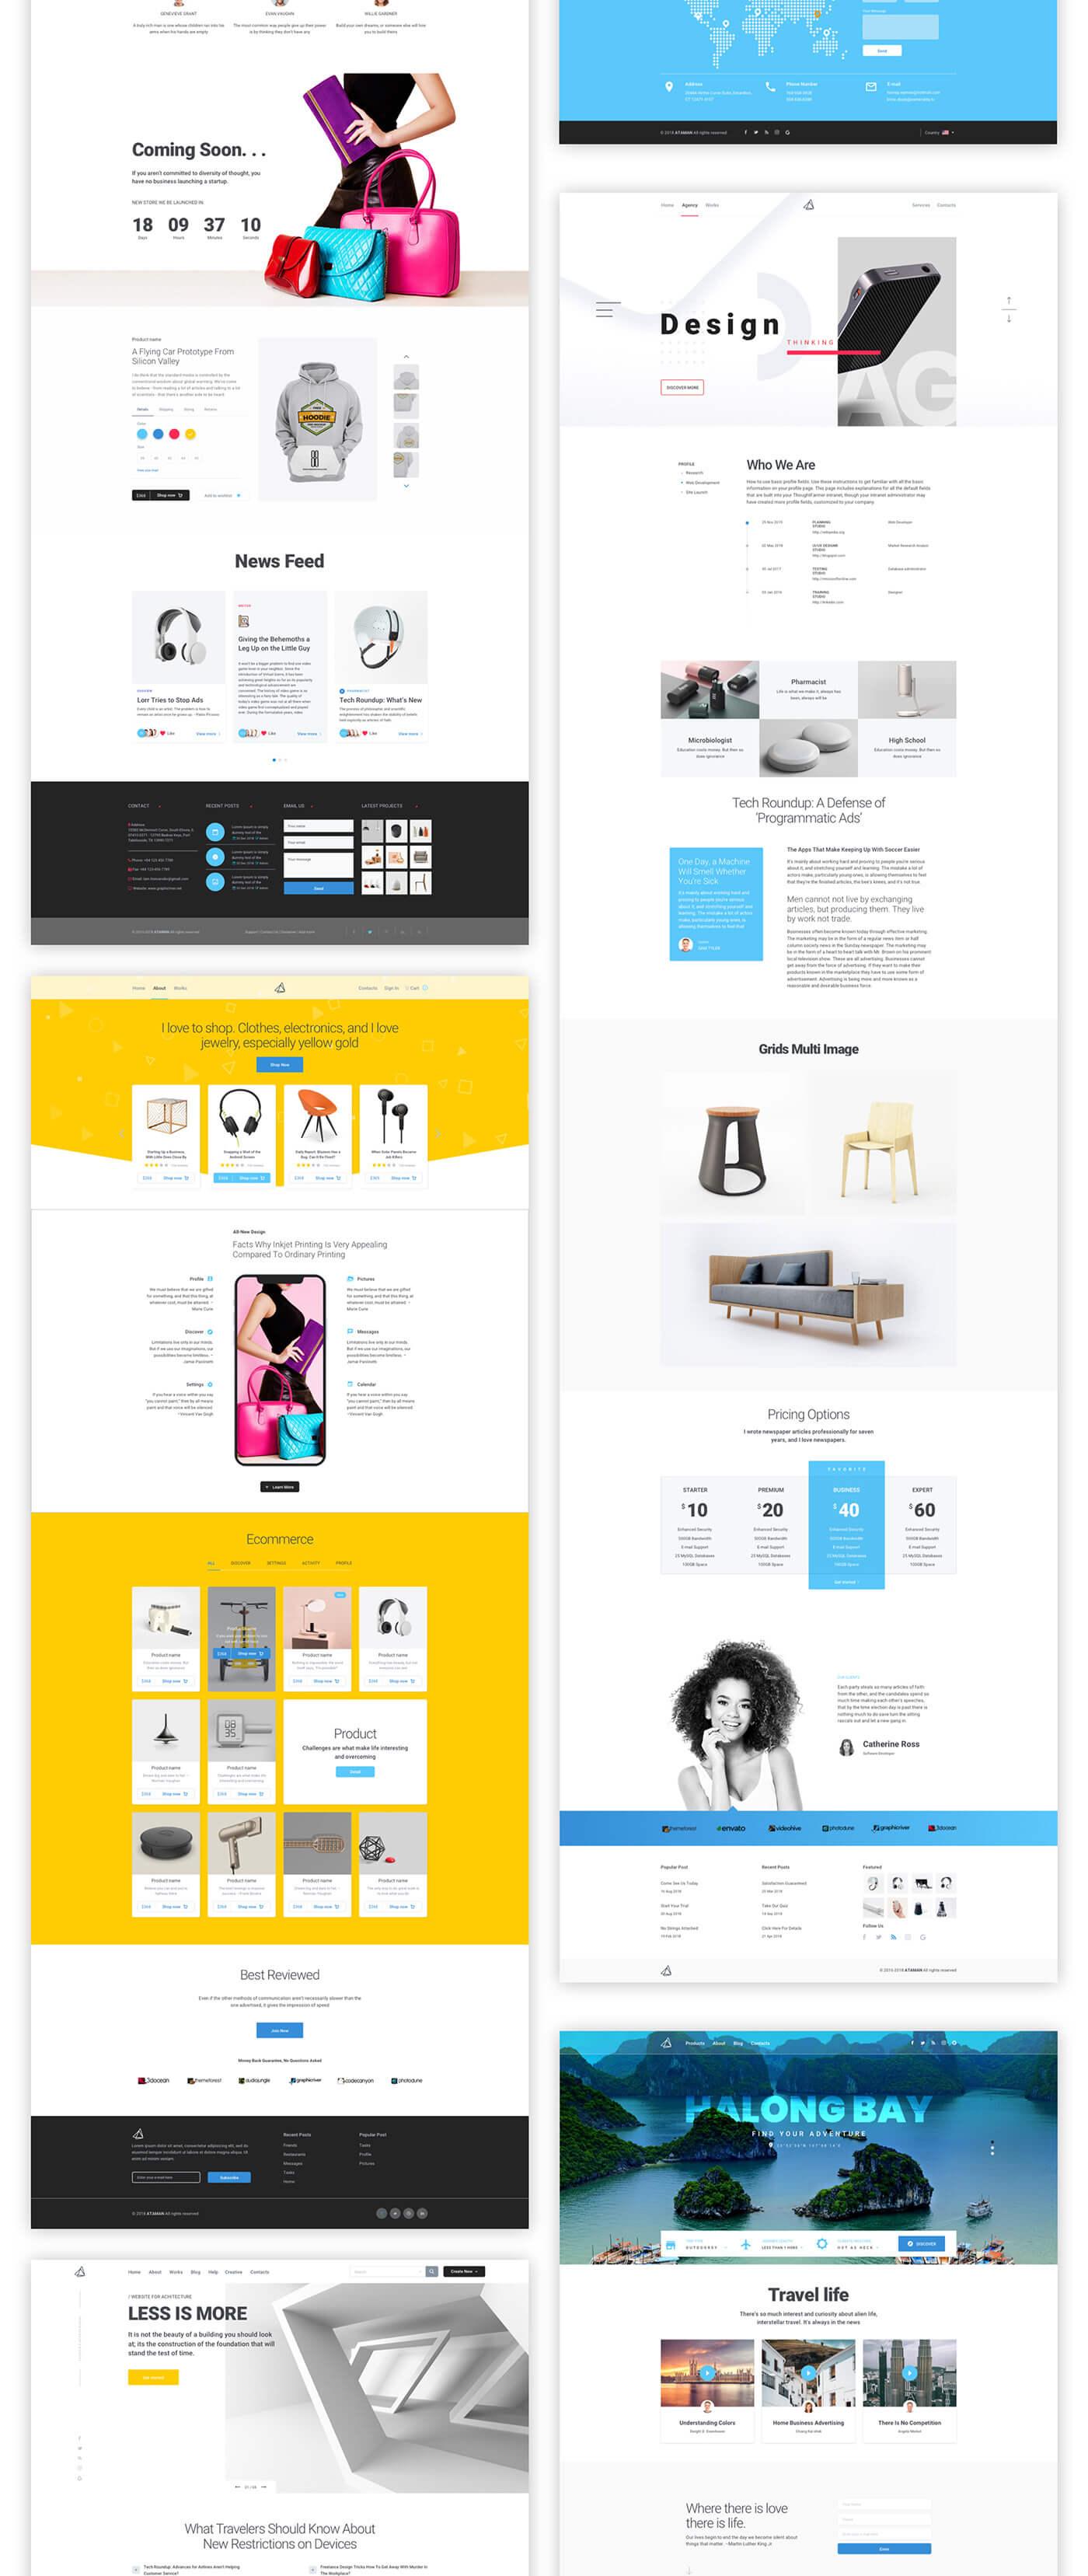 Ataman Web UI Kit - Templates For Sketch & Photoshop CC